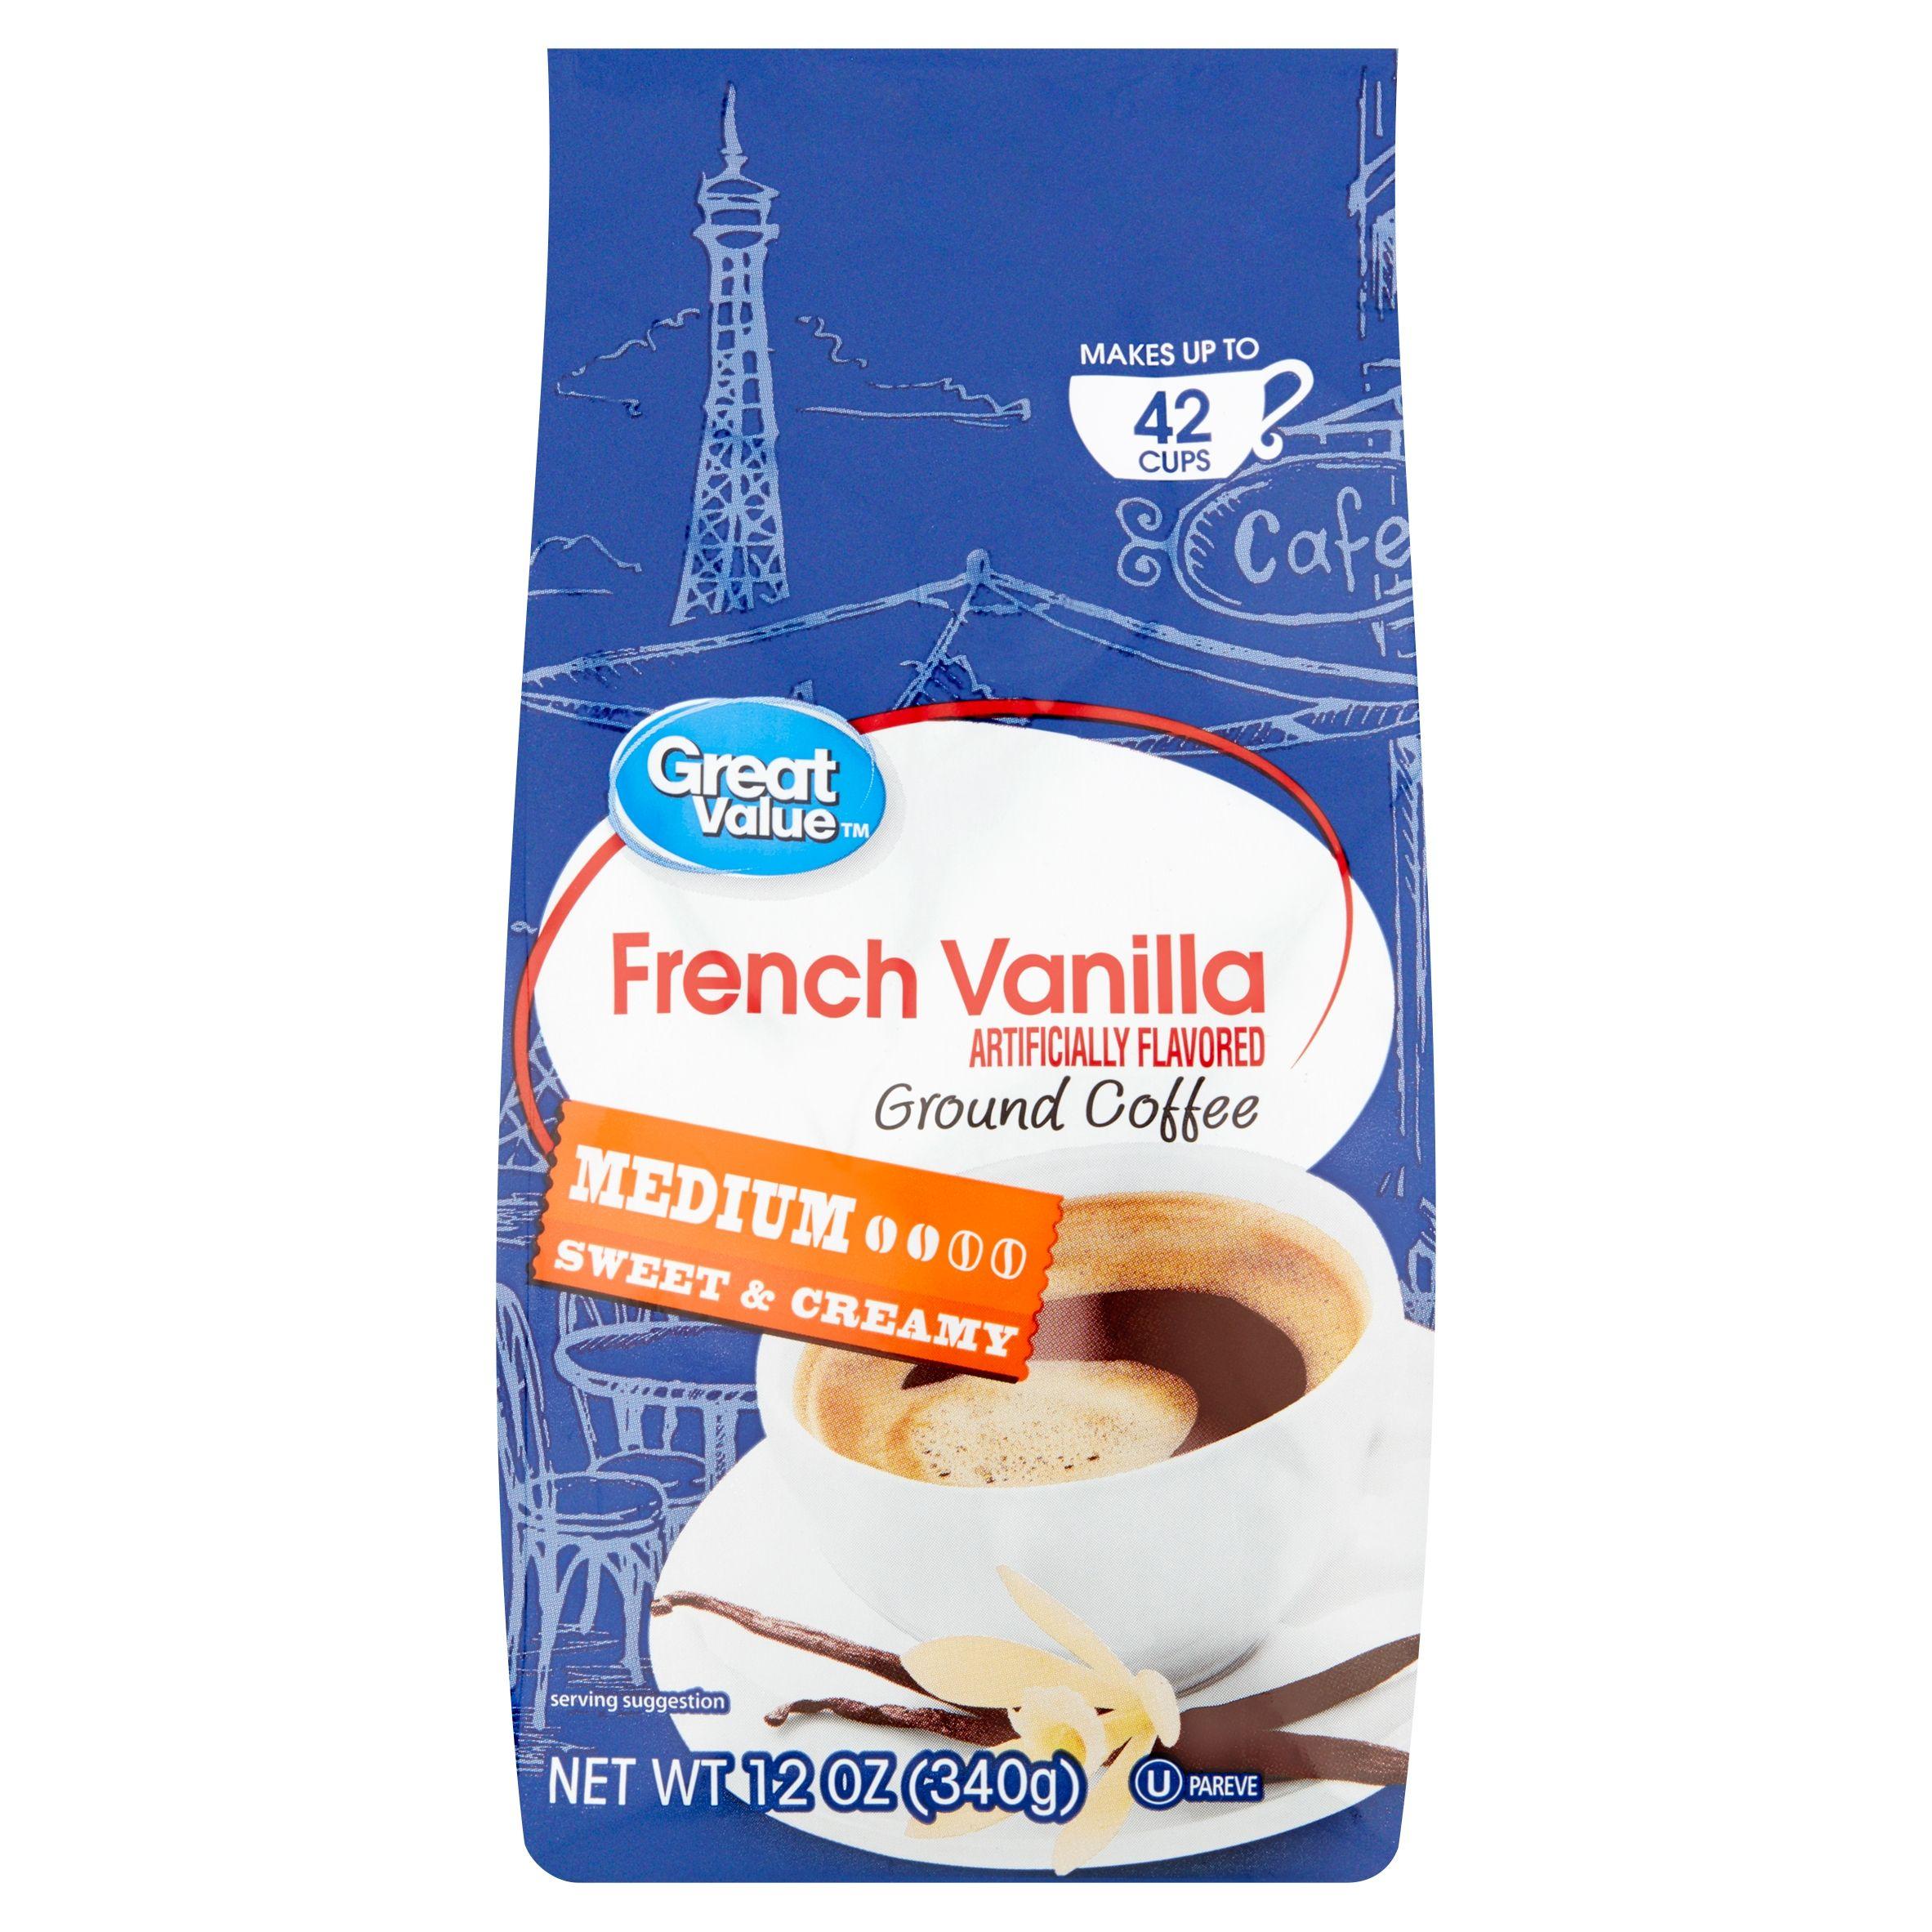 French Vanilla Coffee Beans Calories di 2020